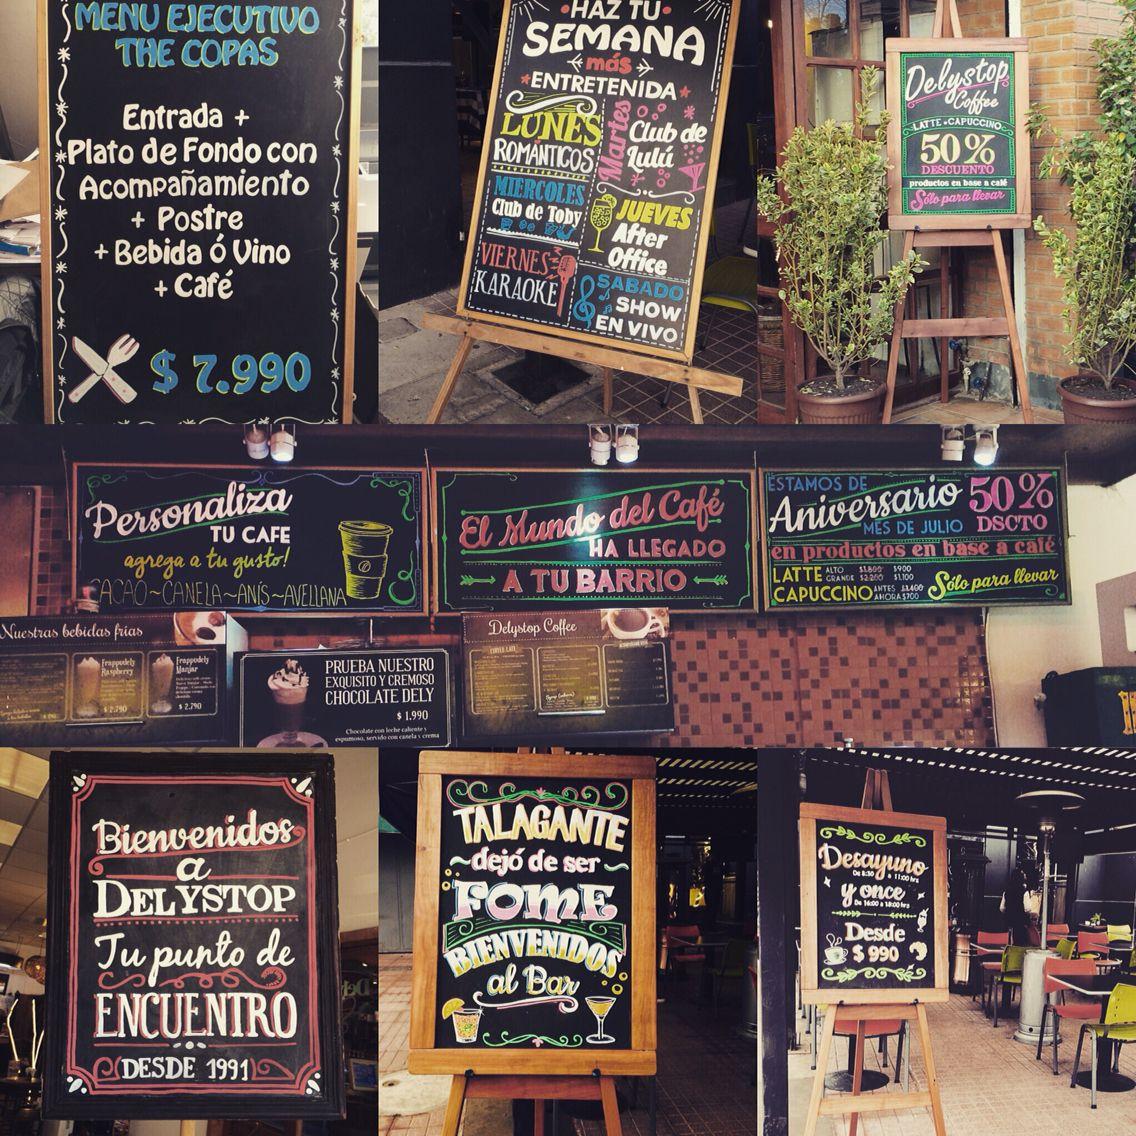 Pizarras para restaurante cafeter a y bar pizarras pinterest chalkboards - Pizarras de bar ...